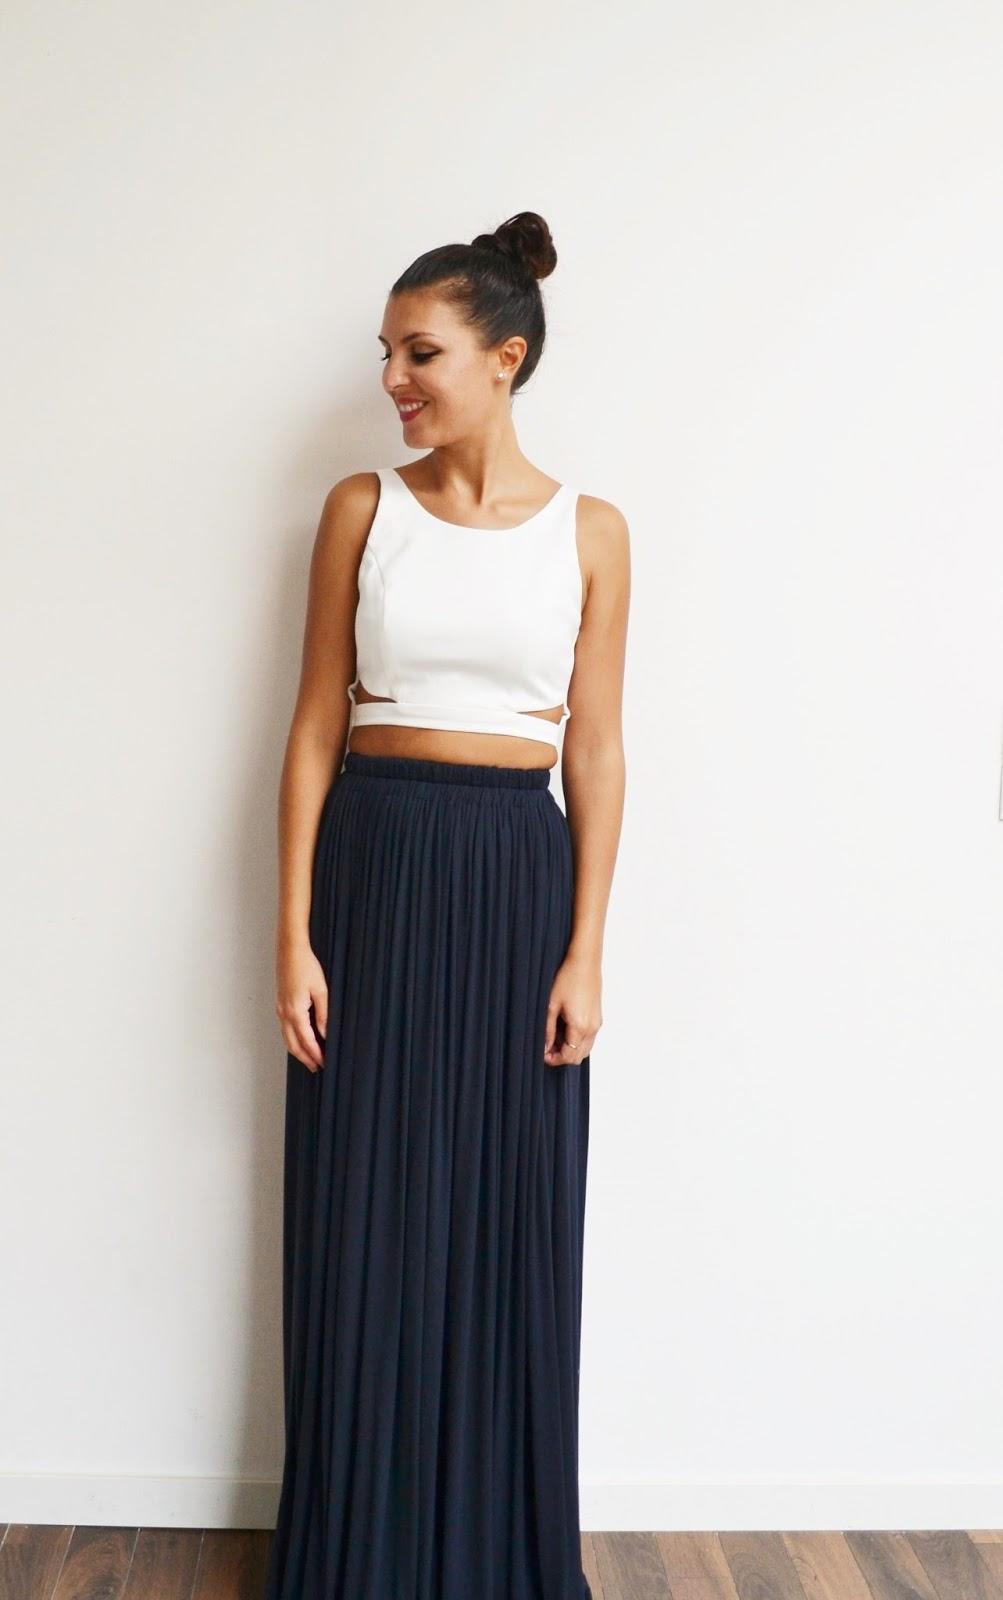 jupe longue bleu marine taille haute pliss e fluide style. Black Bedroom Furniture Sets. Home Design Ideas